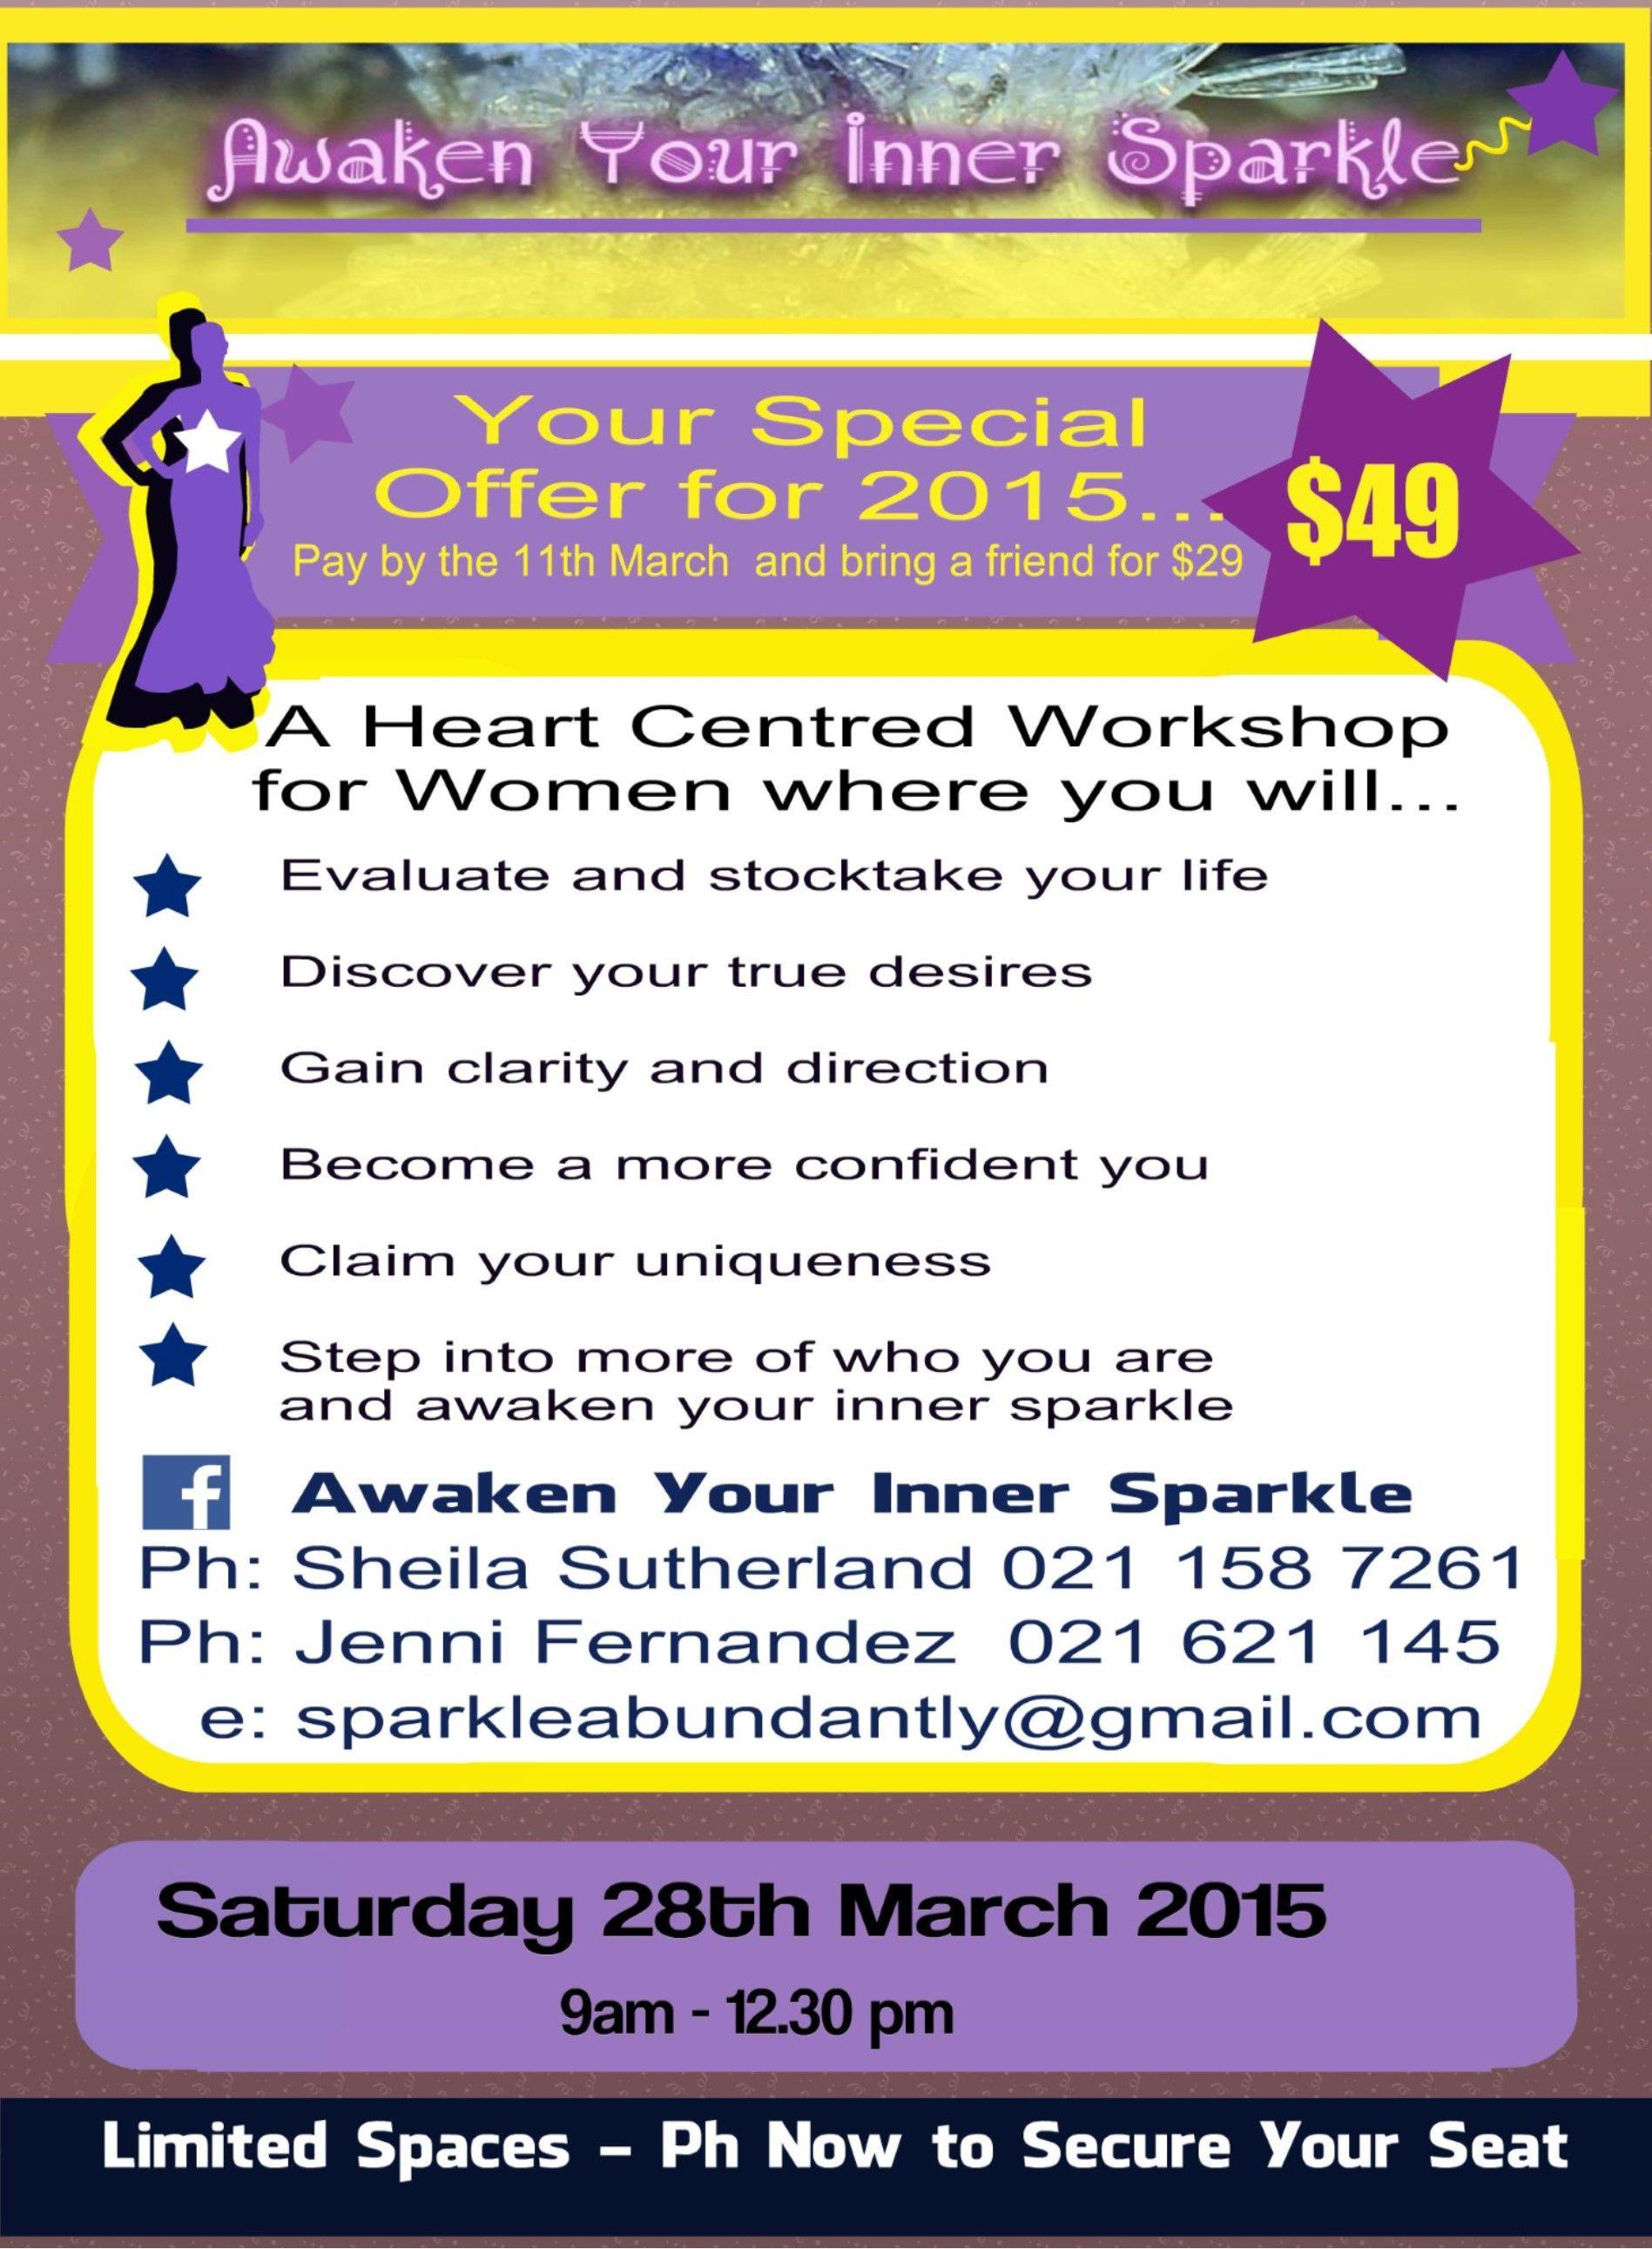 Awaken Your Inner Sparkle Workshop Saturday 28th March Auckland https://www.facebook.com/AwakenYourInnerSparkle